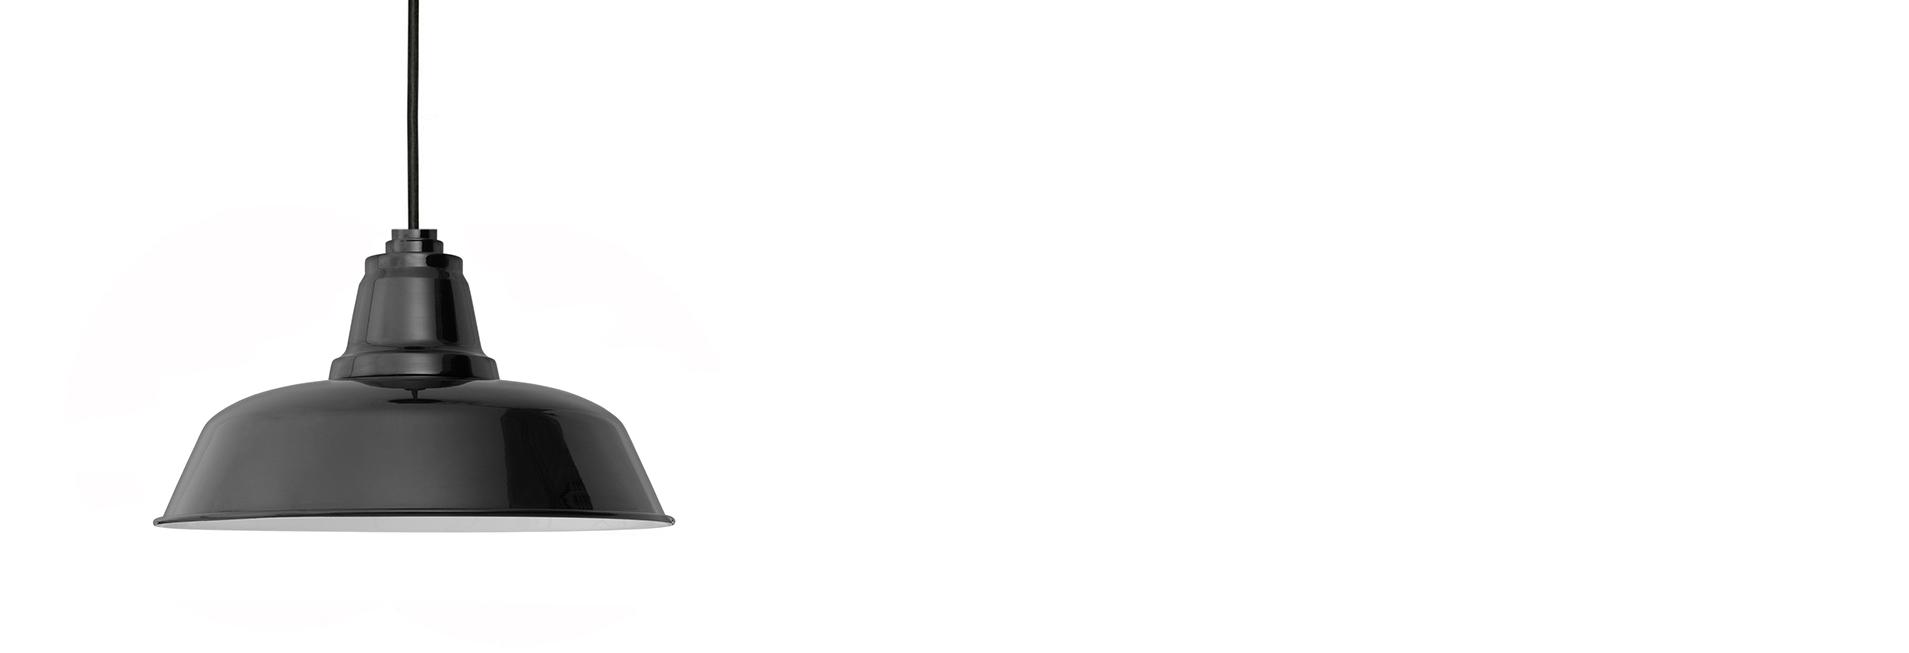 Goodyear LED Pendant Light